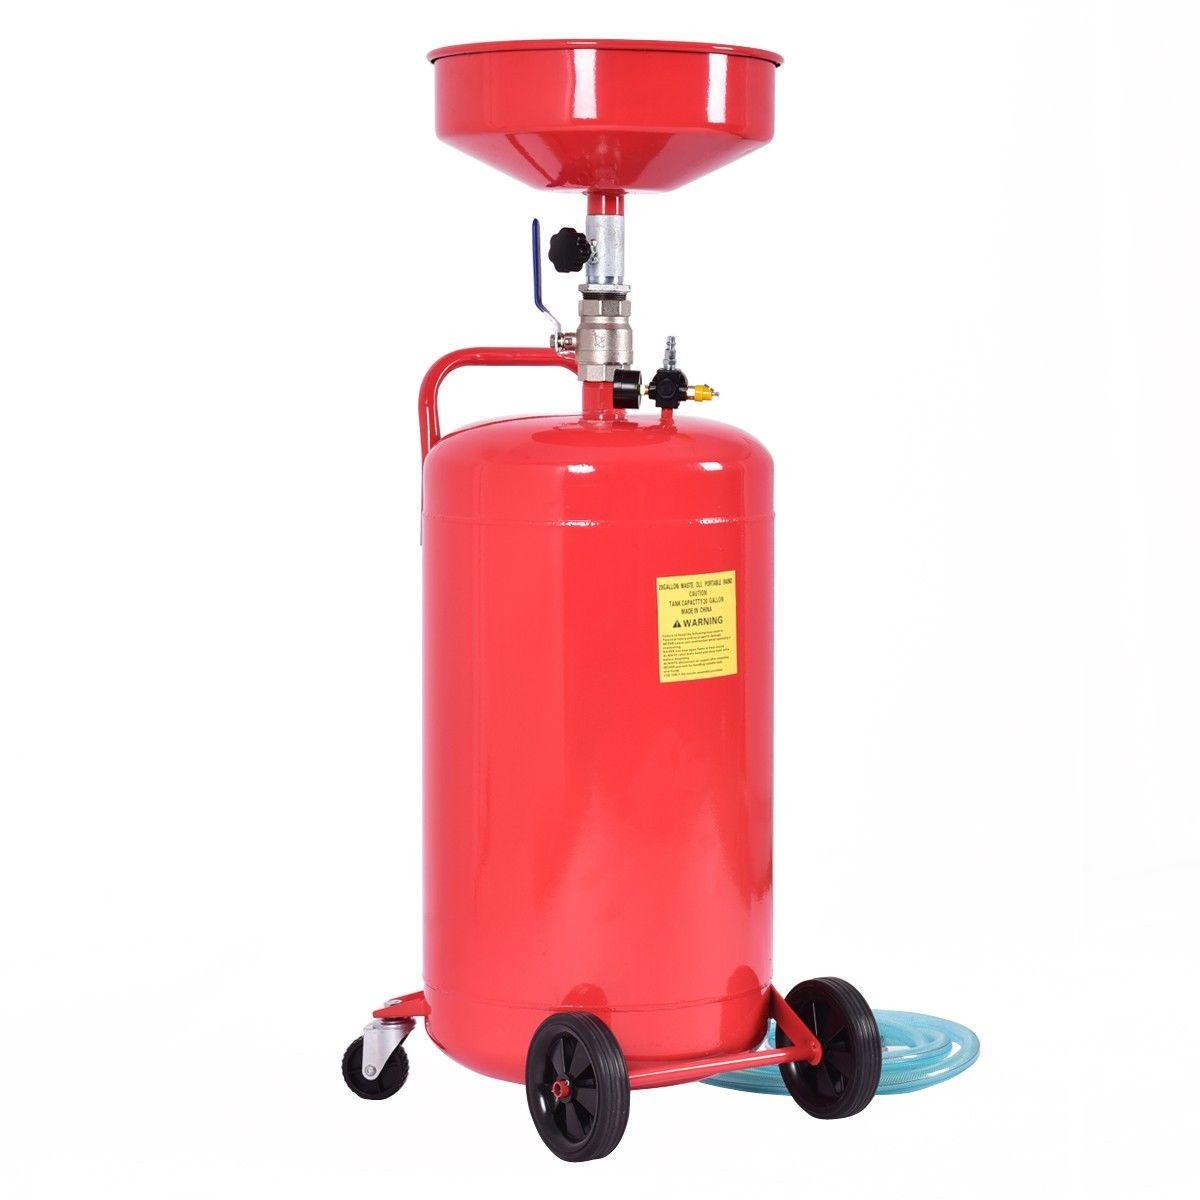 20 Gallon Waste Oil Drain Capacity Tank Air Operate Drainer Portable Wheel Hose